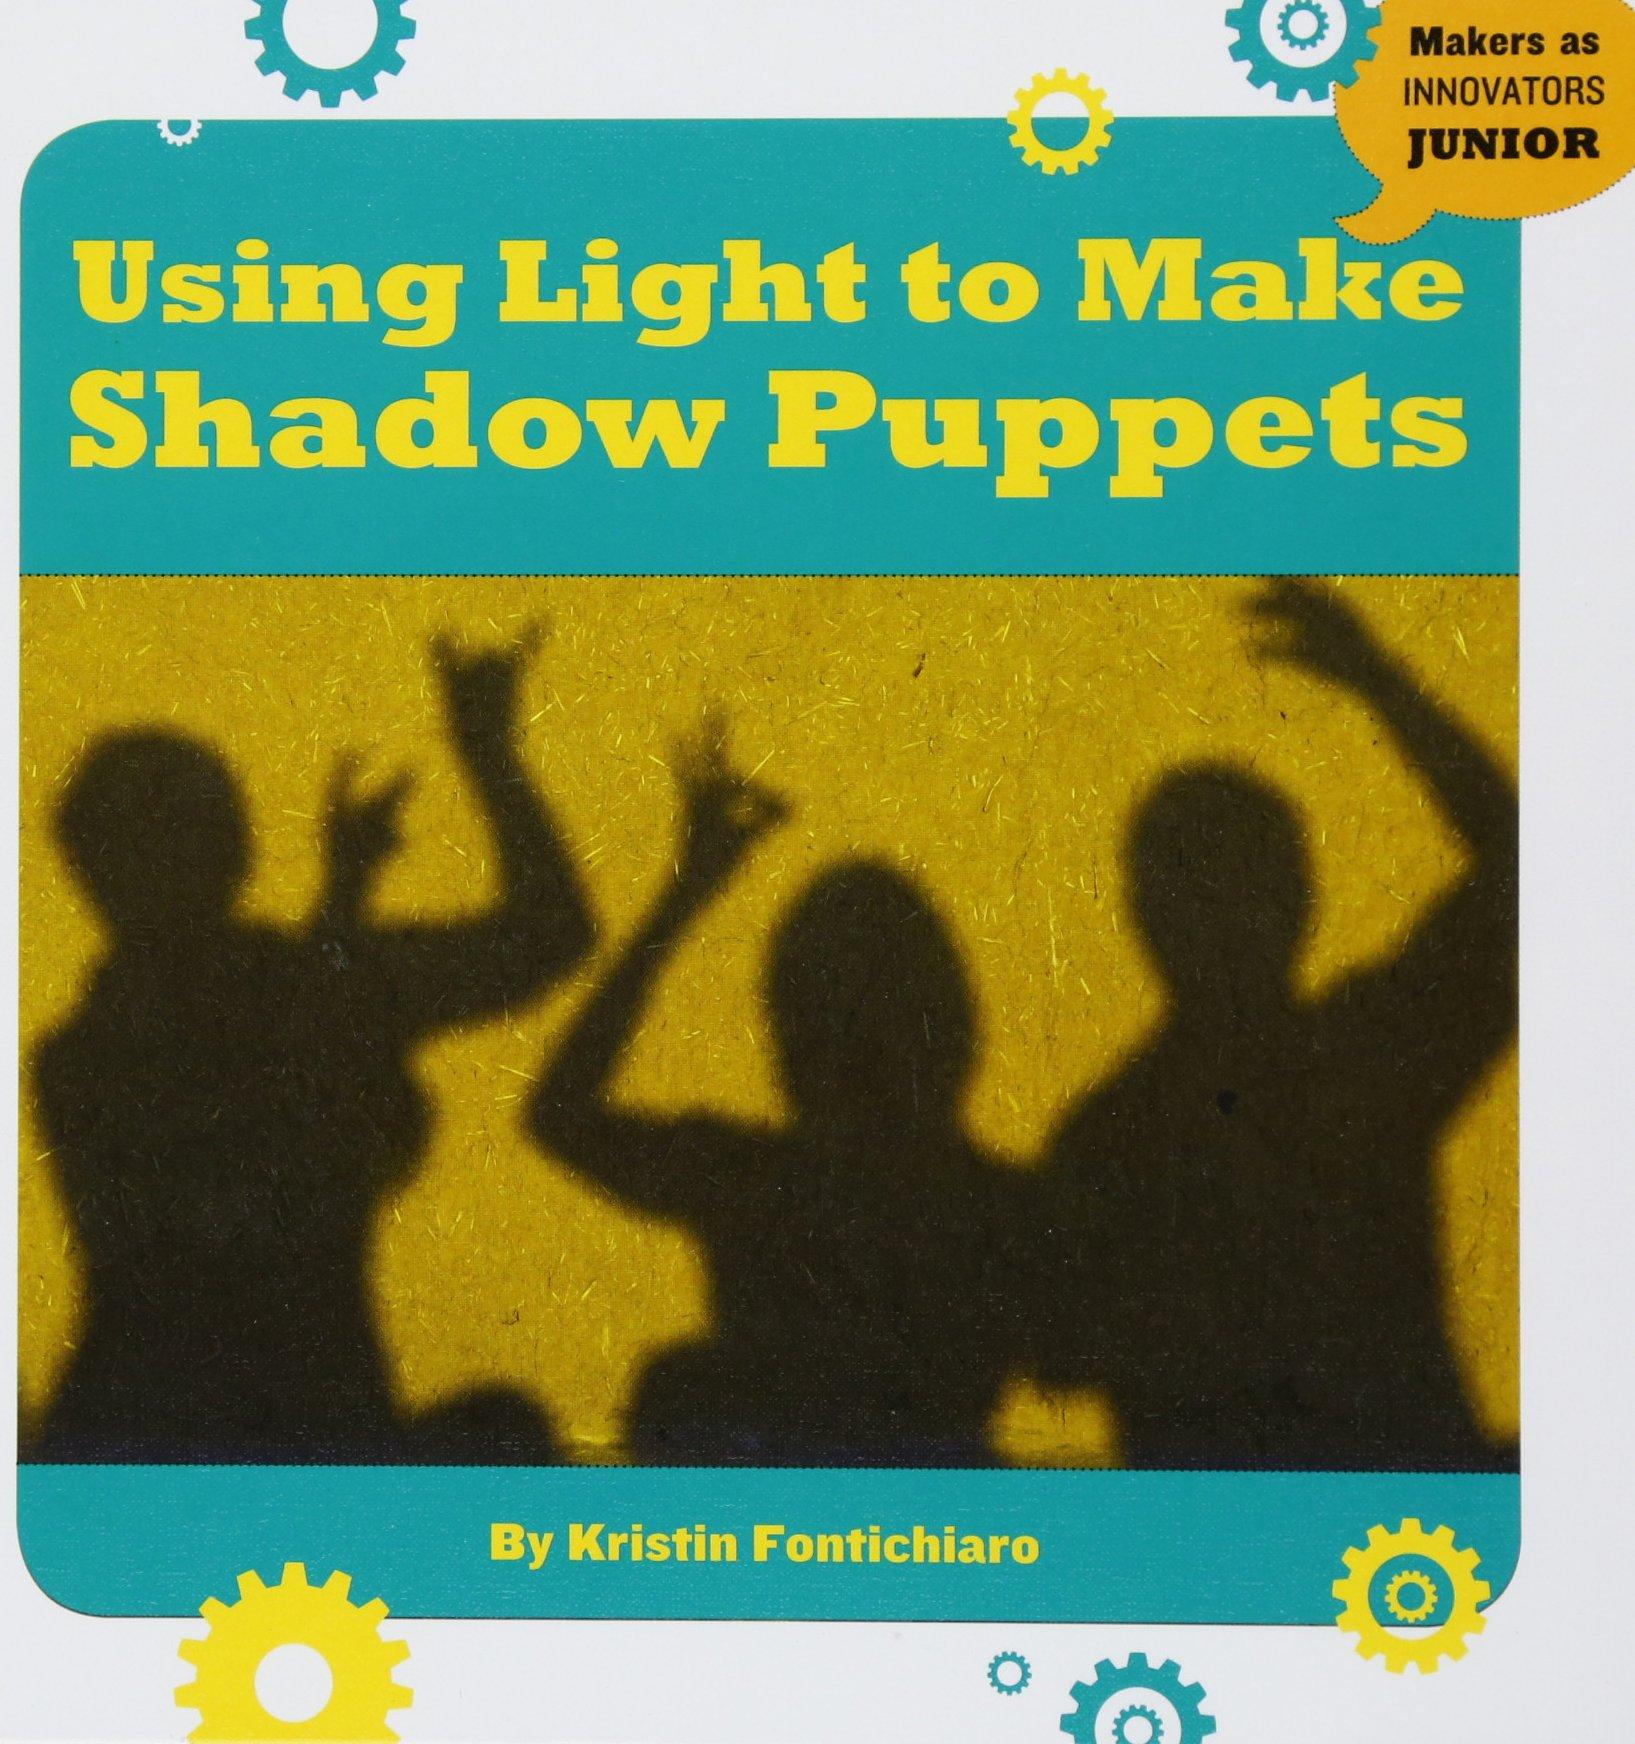 Using Light to Make Shadow Puppets (21st Century Skills Innovation Library: Makers As Innovators Junior) pdf epub